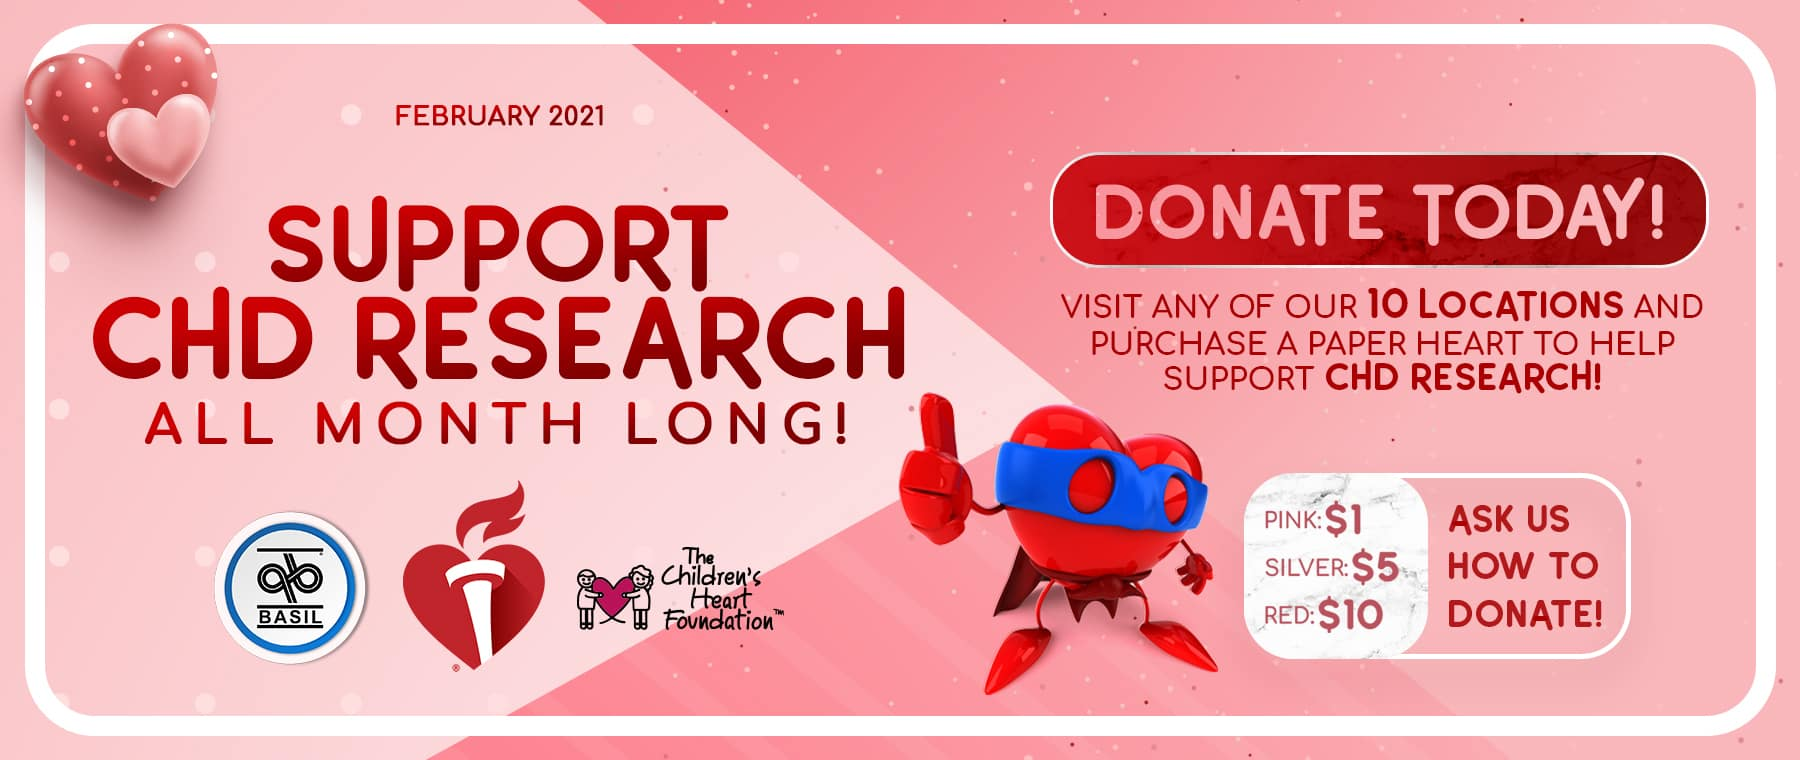 CHD Research February